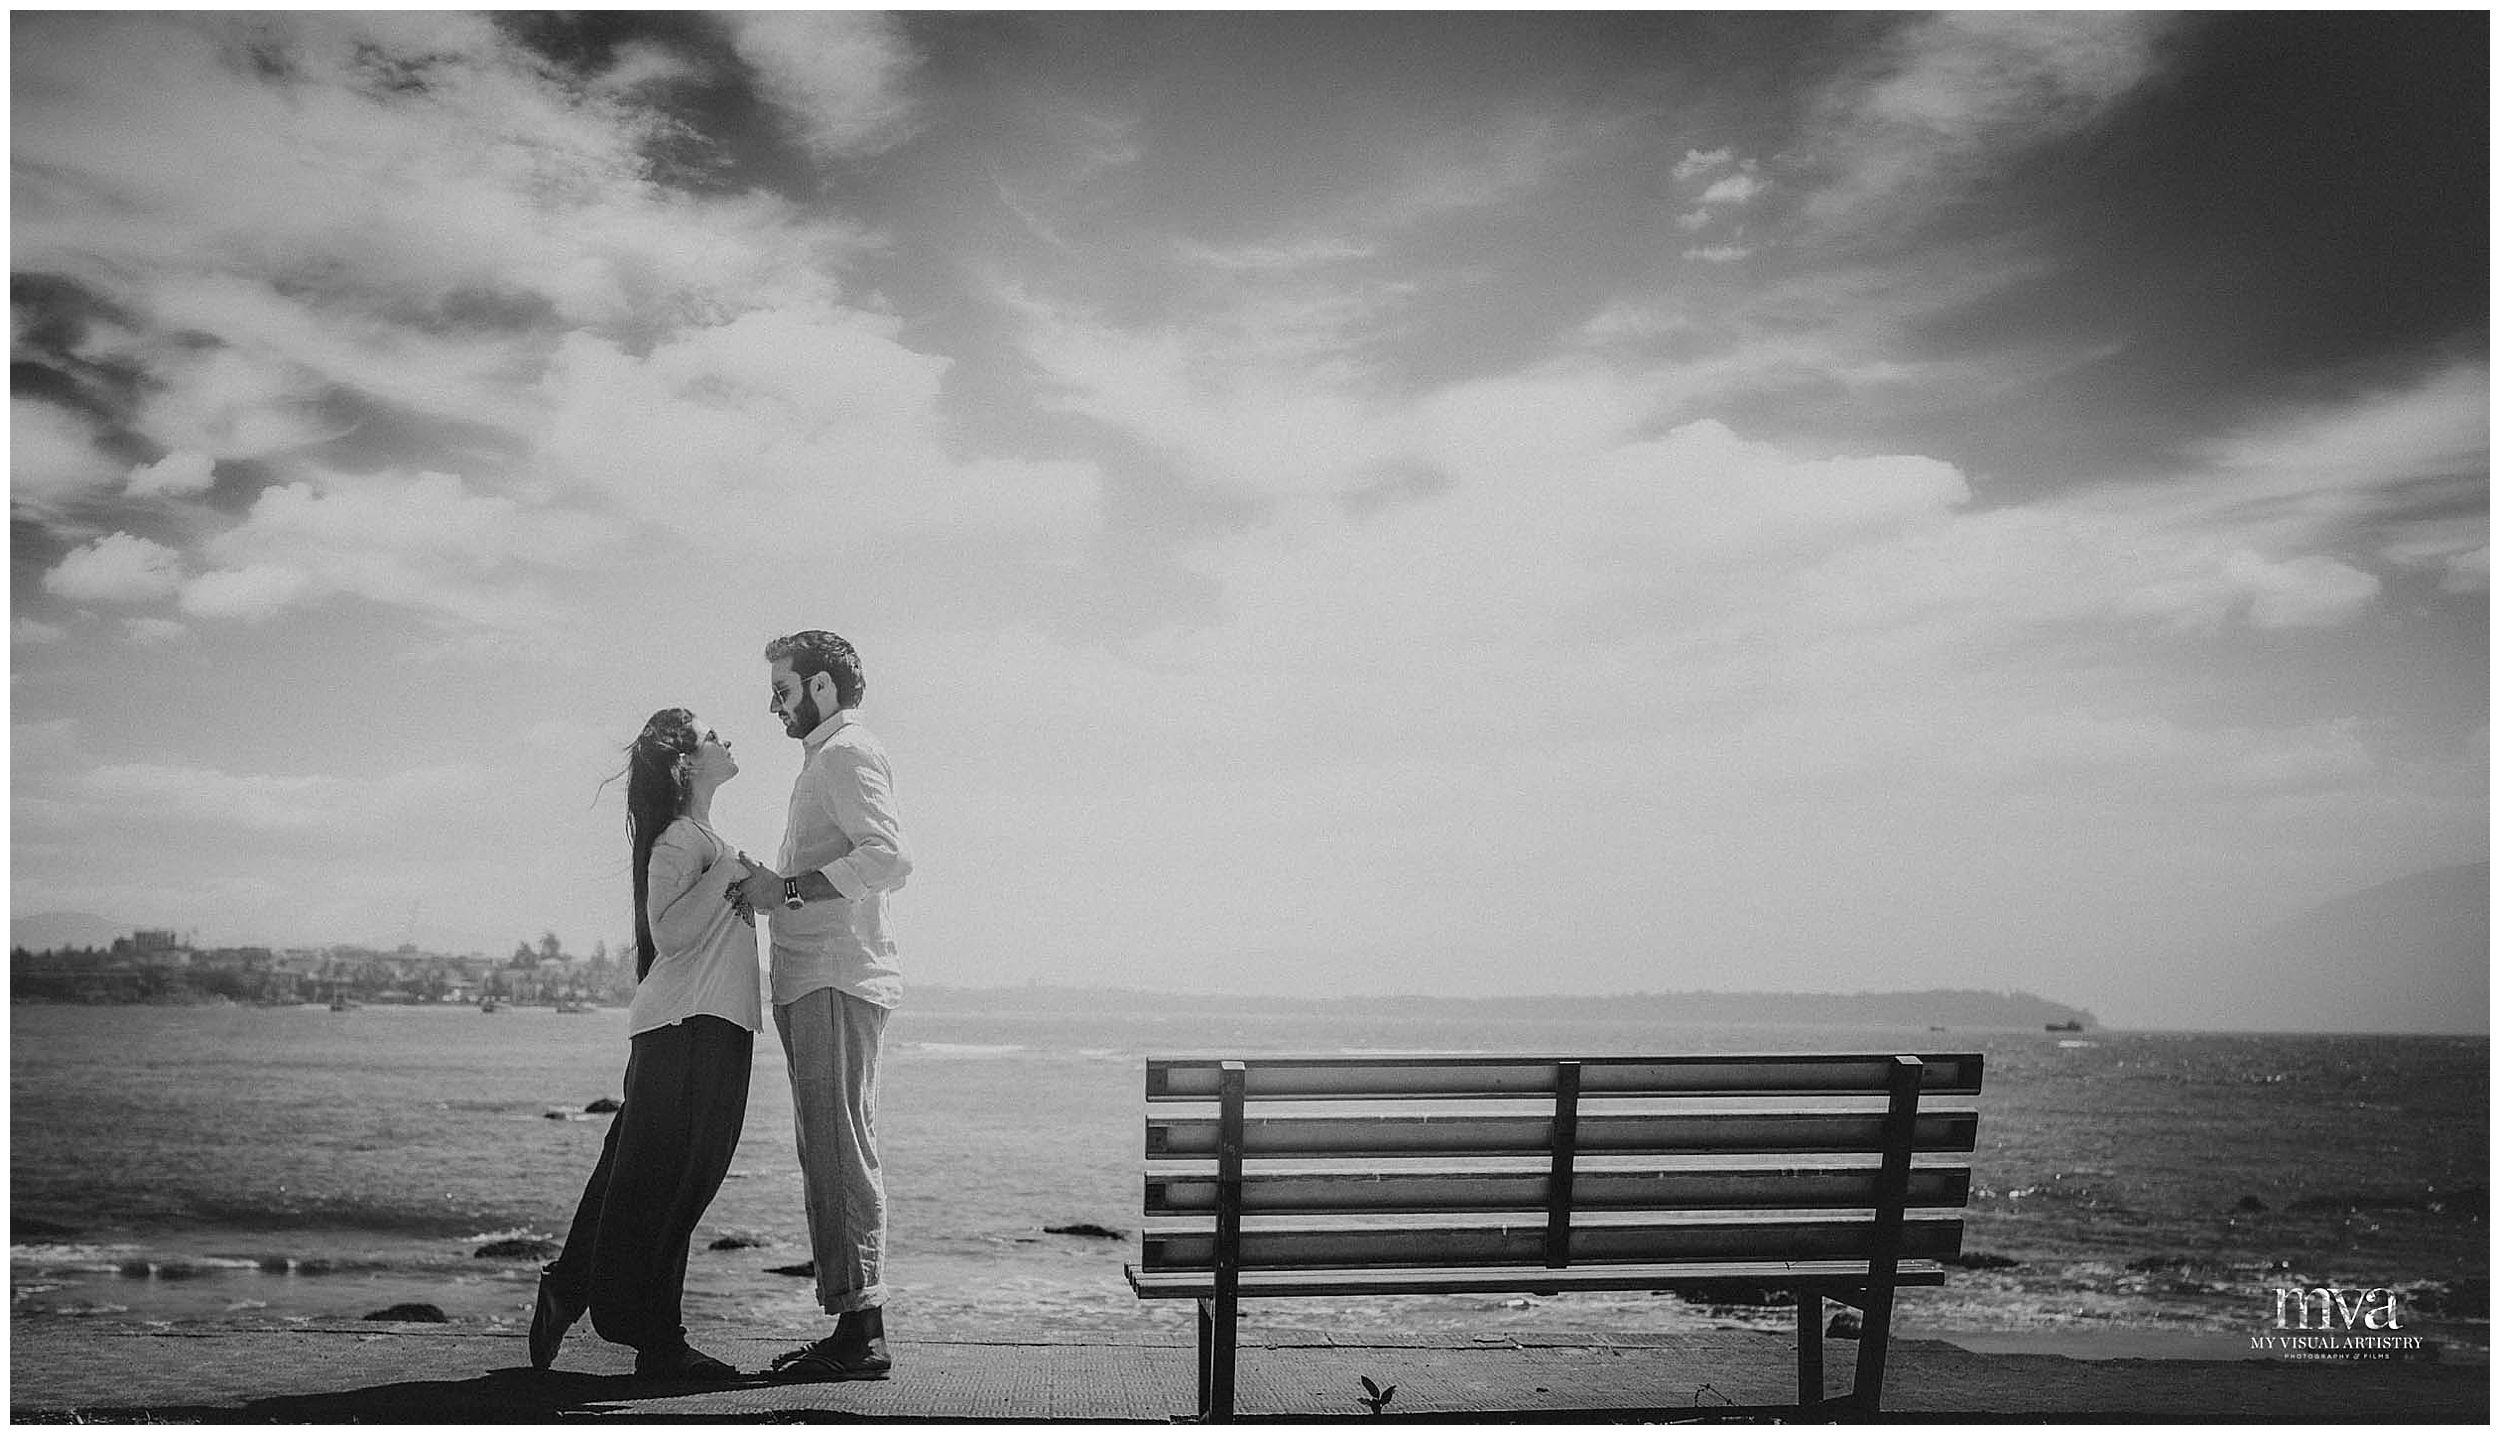 PAYAL_RAGHAV_MYVISUALARTISTRY__WEDDING_PHOTOGRAPHER_COUPLESHOOT_DESTINATION_GOA_PREWEDDING_0005.jpg